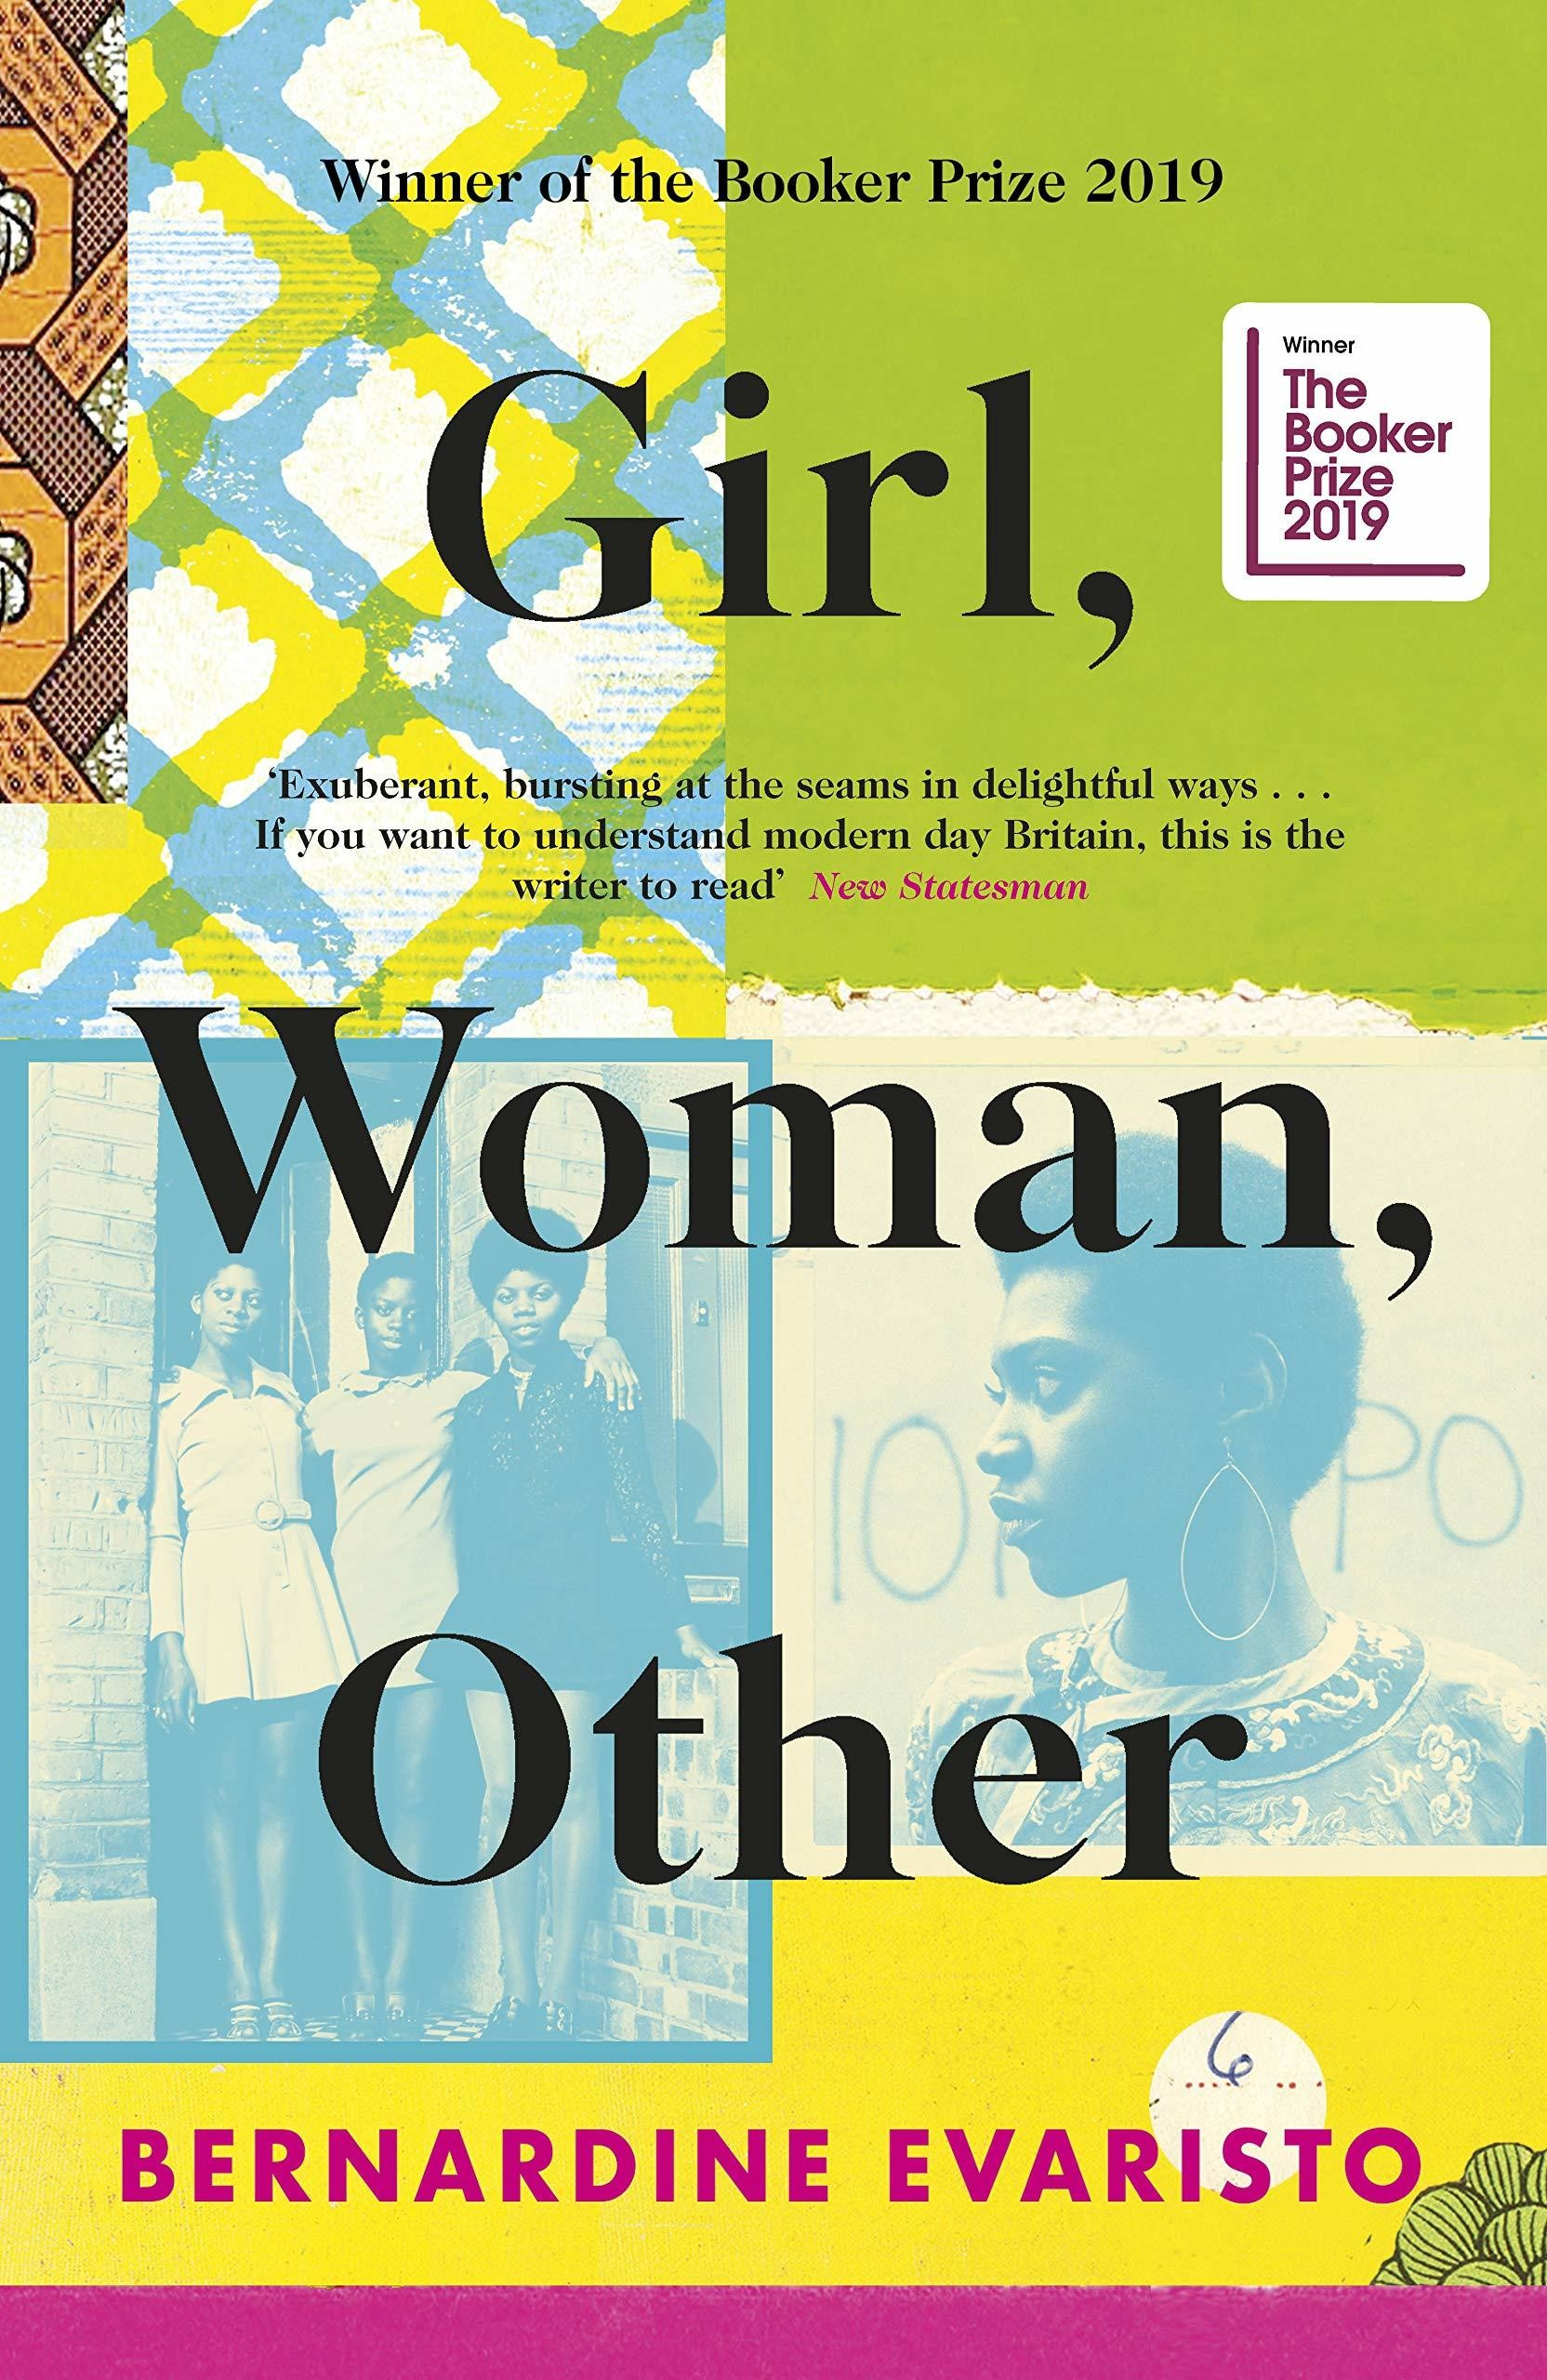 girl woman other bernardine evaristo booker prize Barack Obama